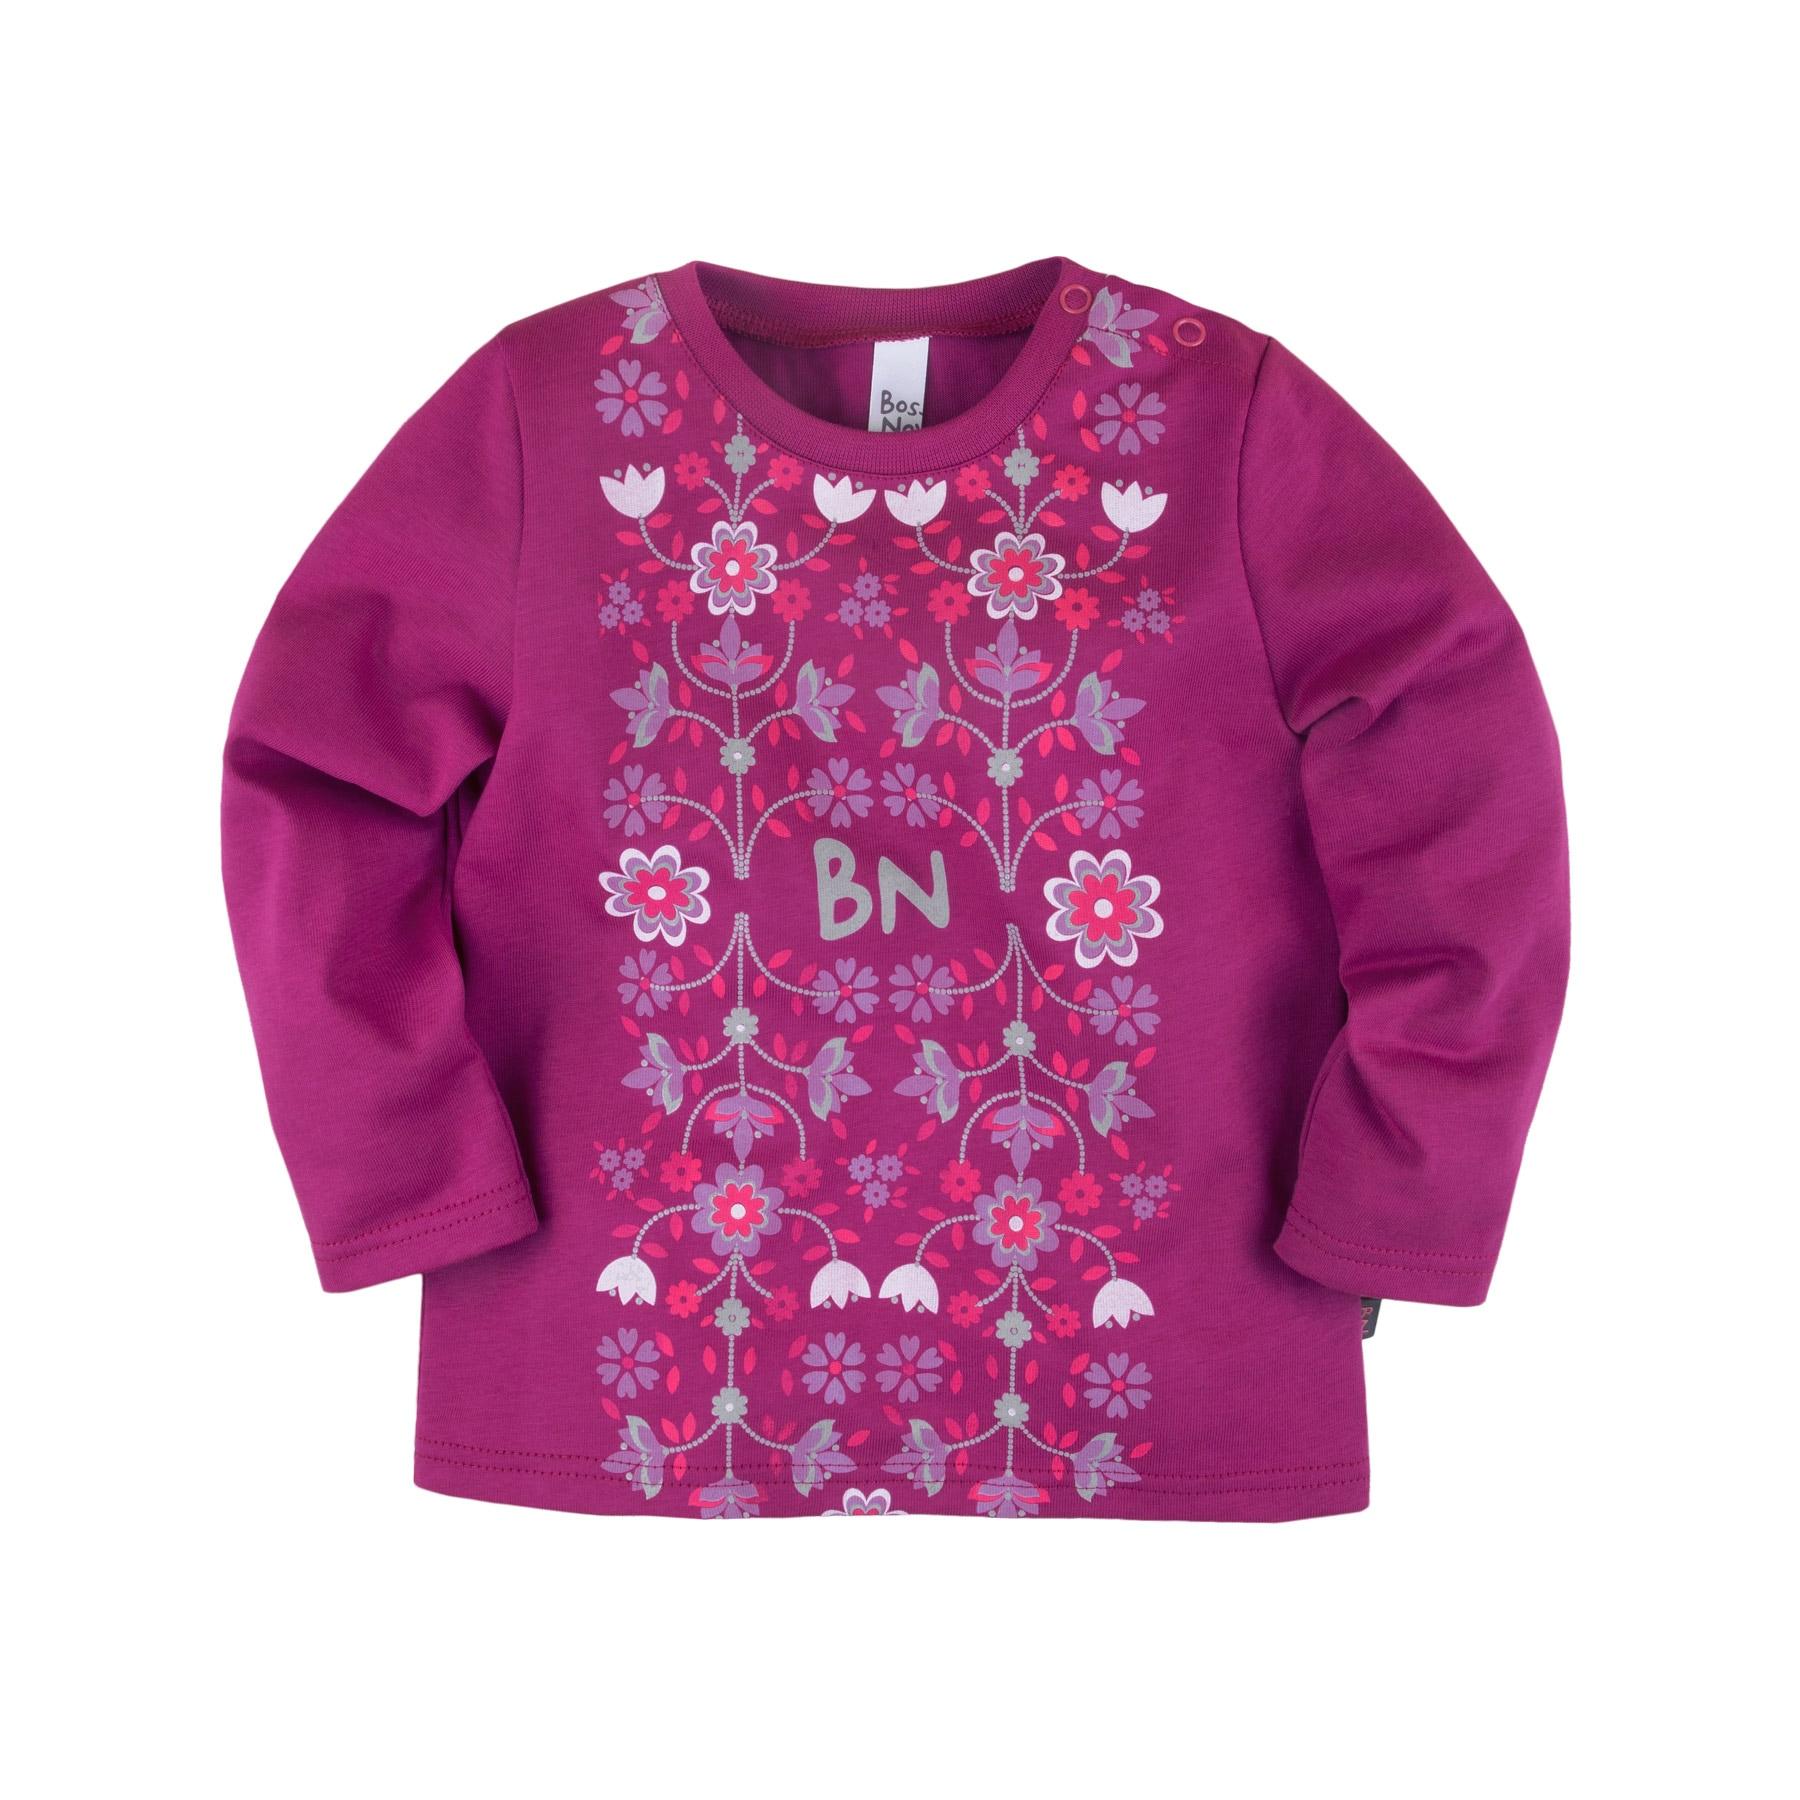 Children Hoodies Sweatshirts Bossa Nova 552B-161f hoodies